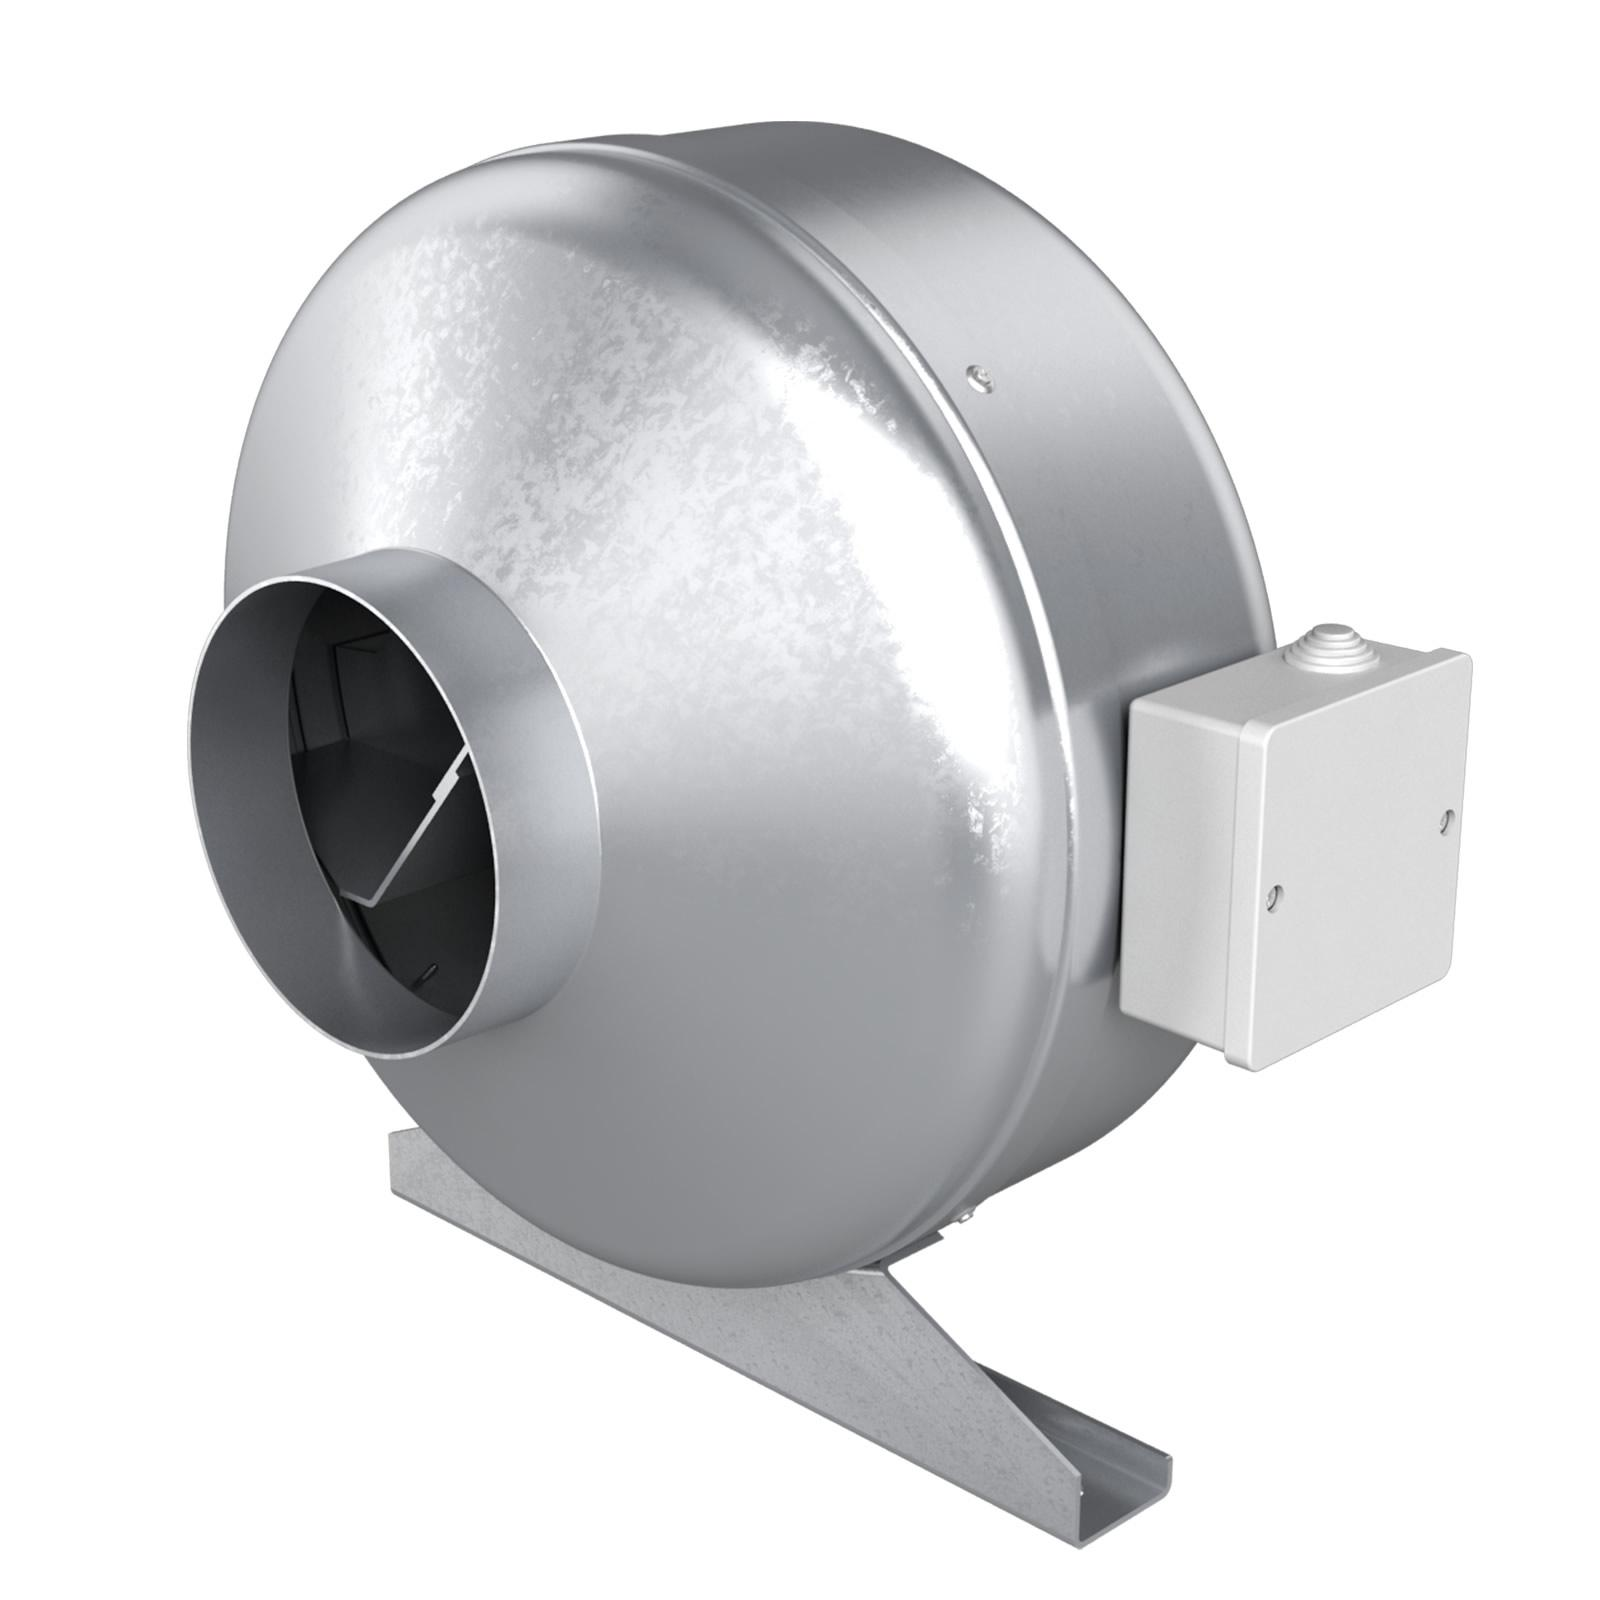 Вентилятор Era Mars gdf 125